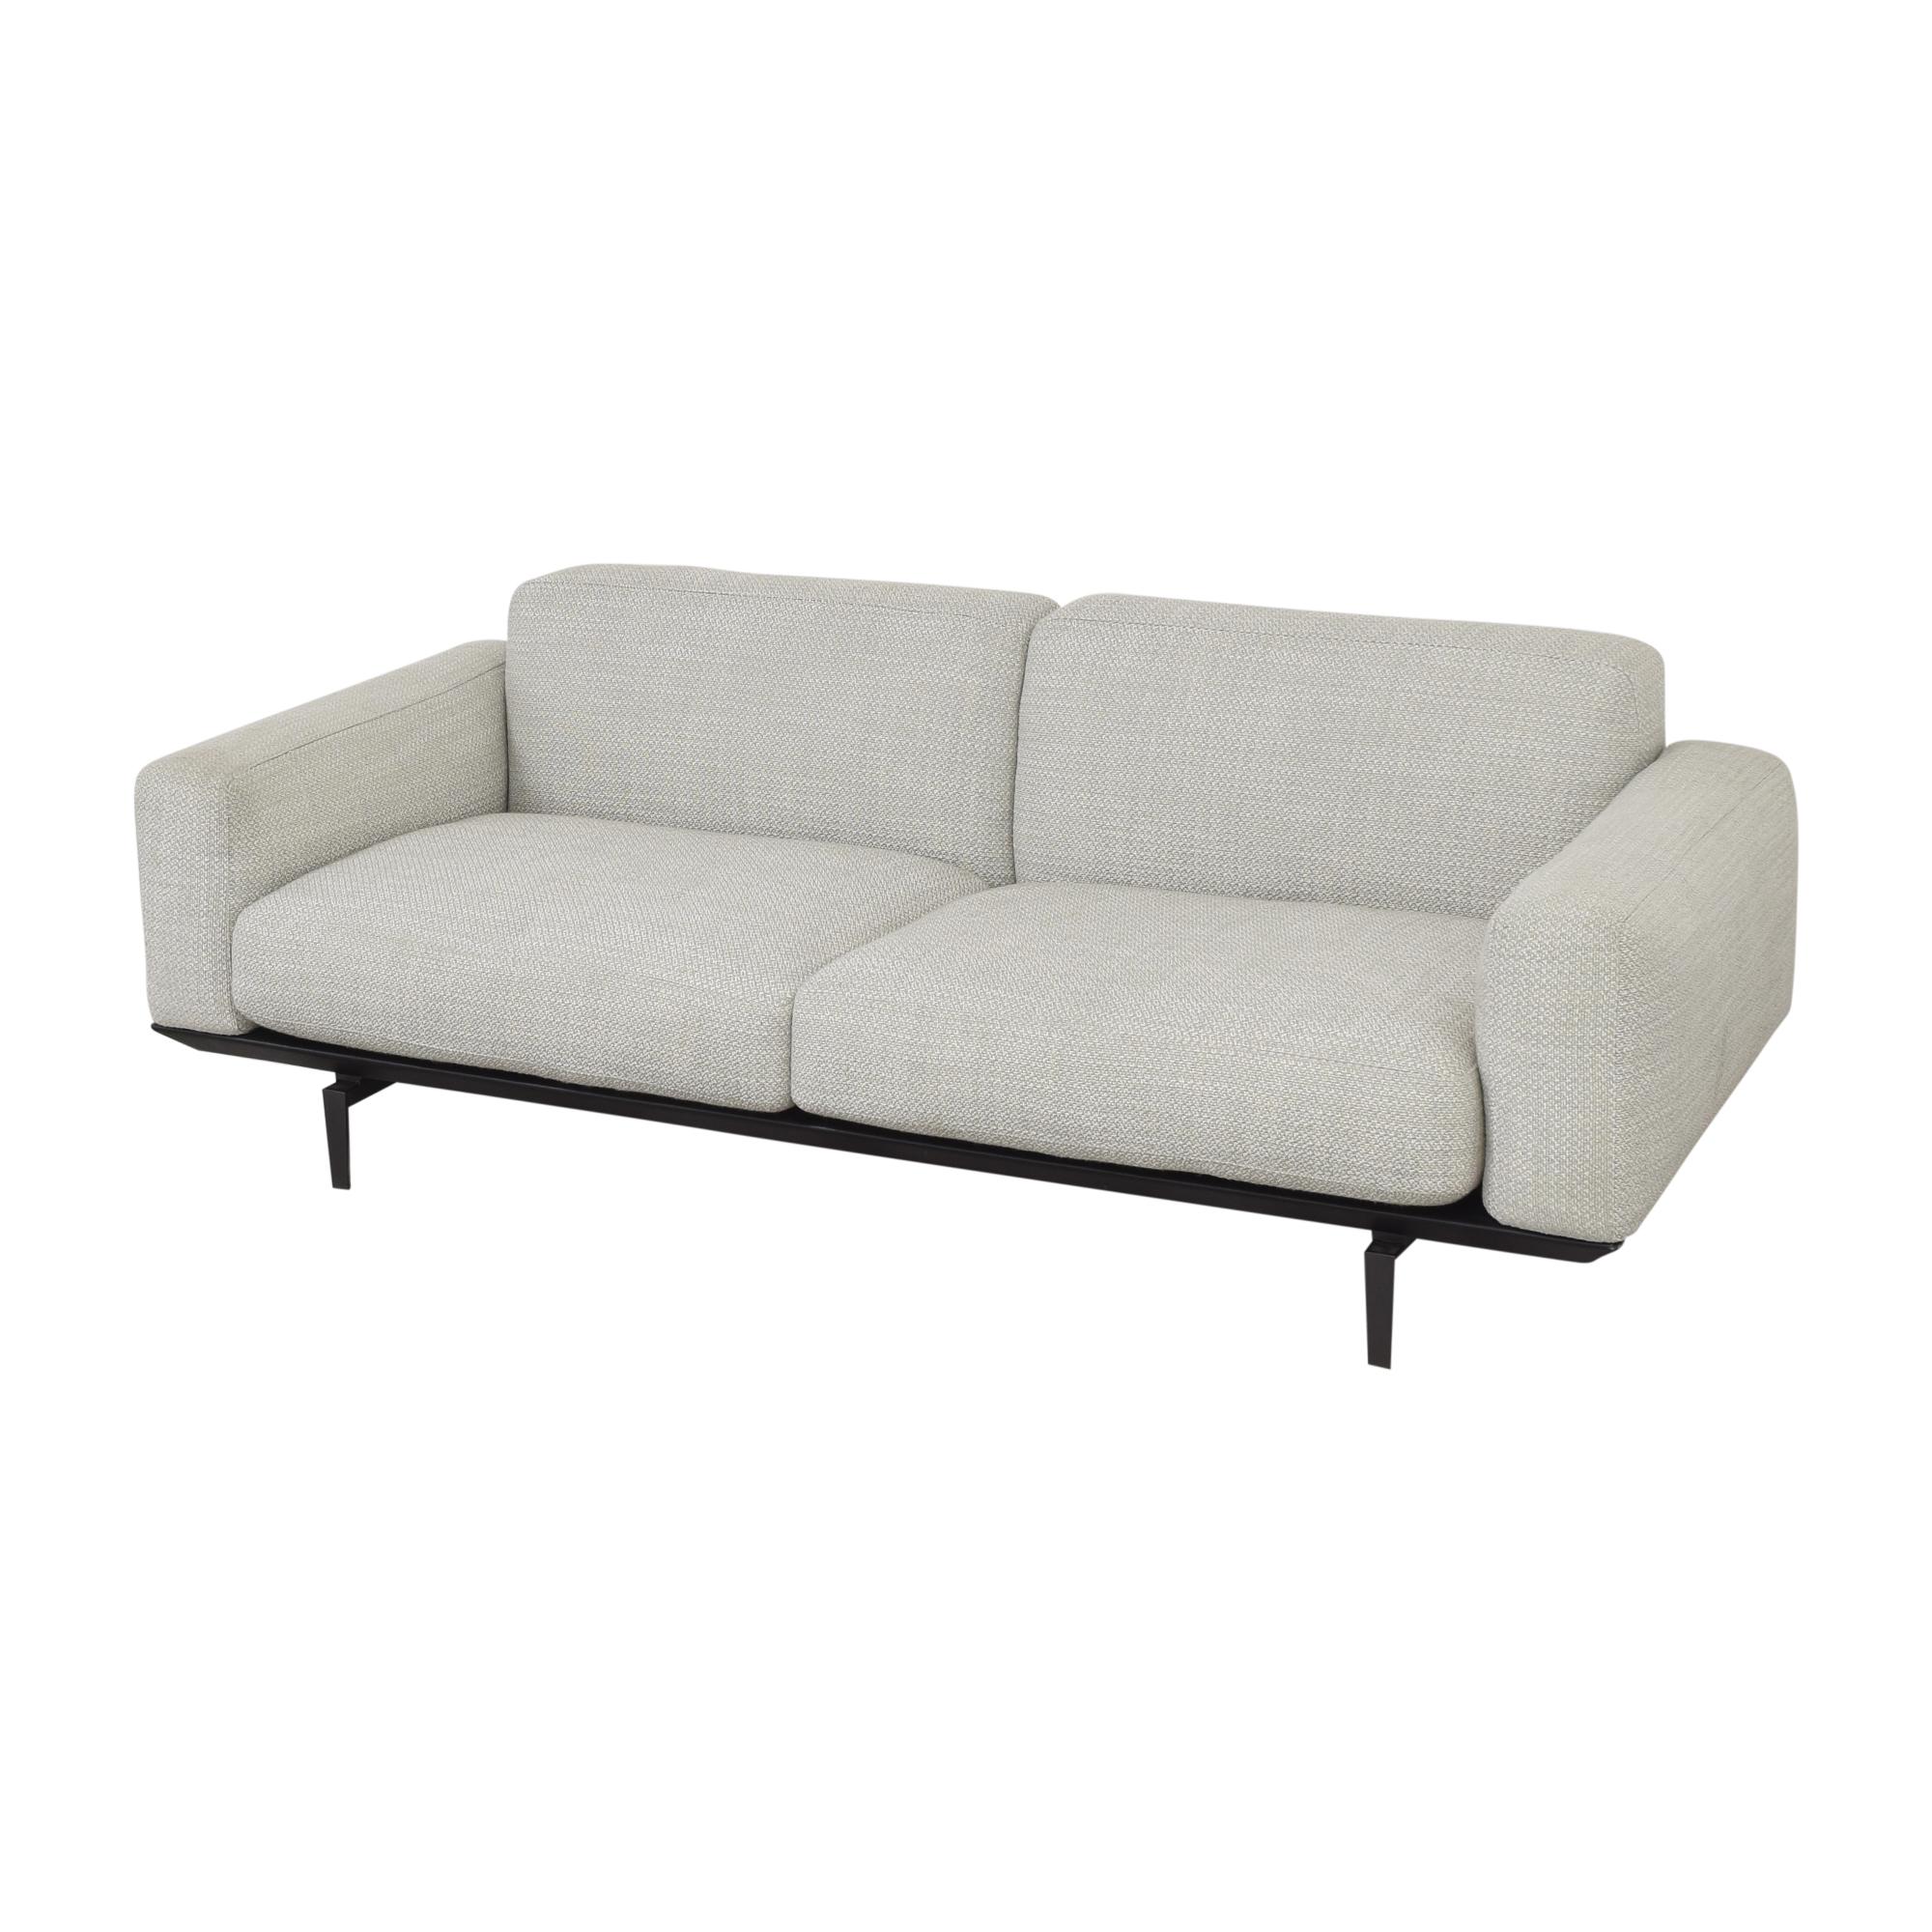 BoConcept BoConcept Two Cushion Sofa for sale